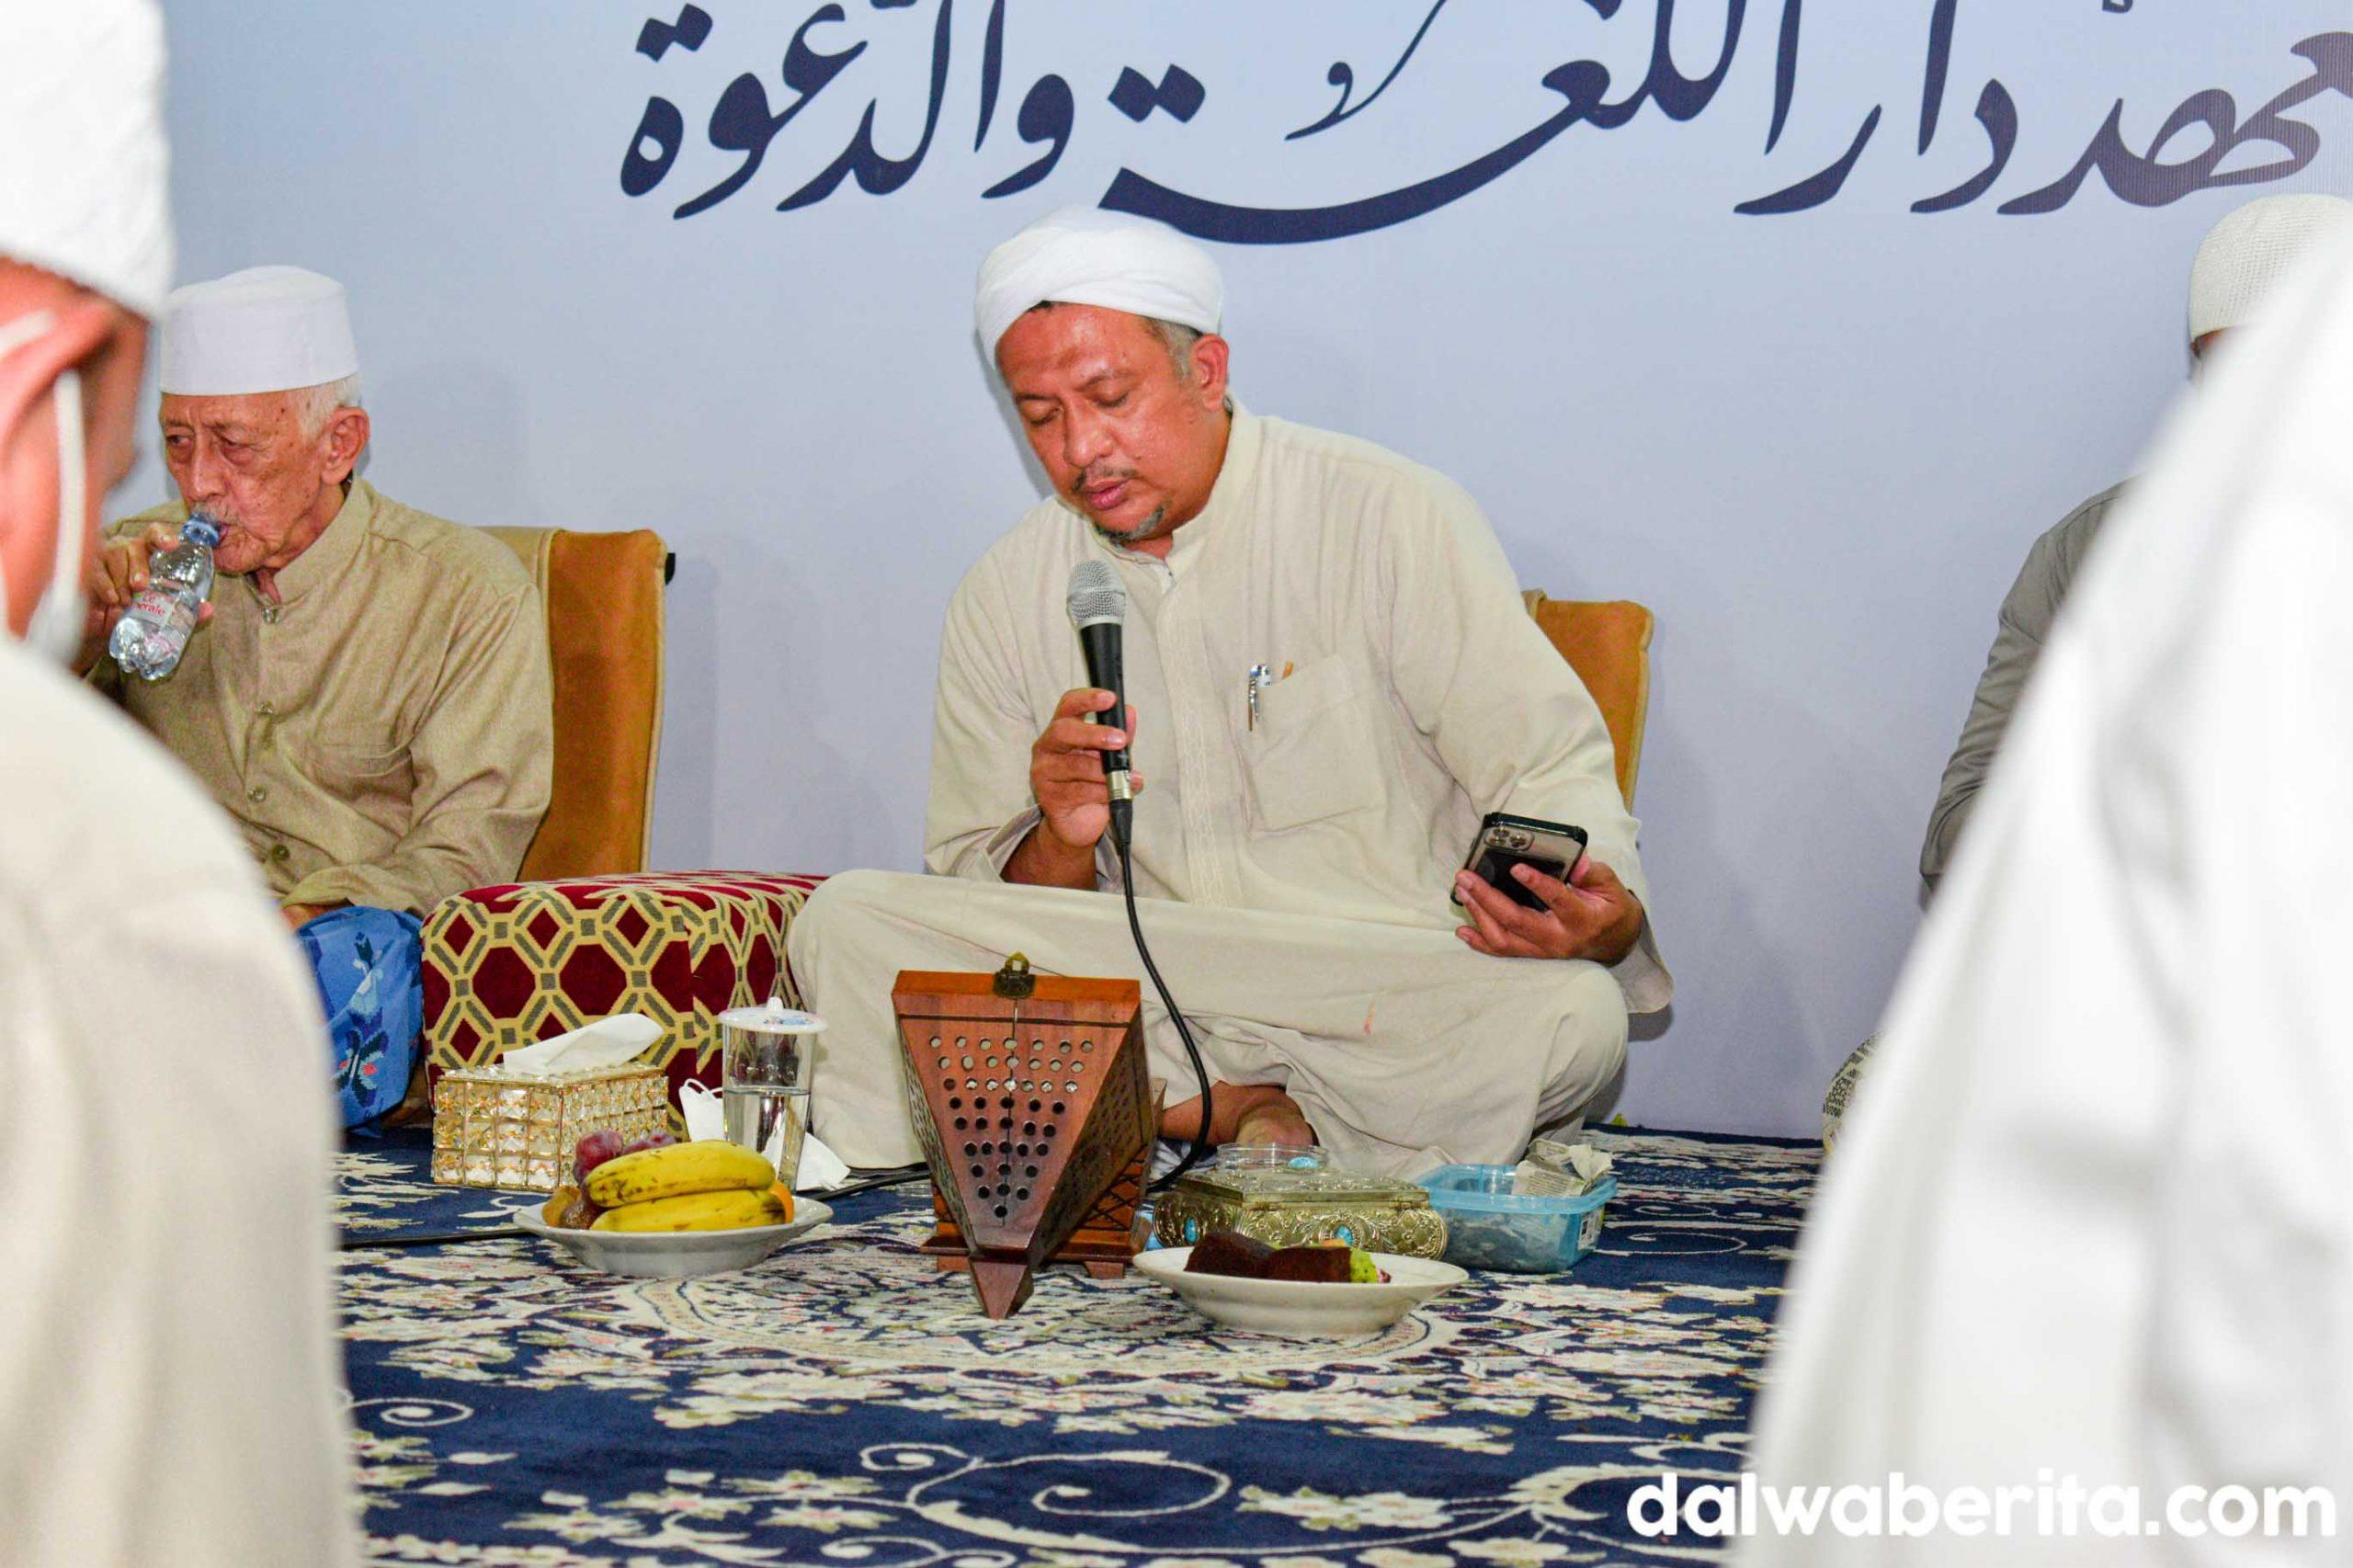 Kenang 40 Hari Kepergian Syarifah Zainab binti Husein Assegaf, Ponpes Dalwa Adakan Pembacaan Tahlil